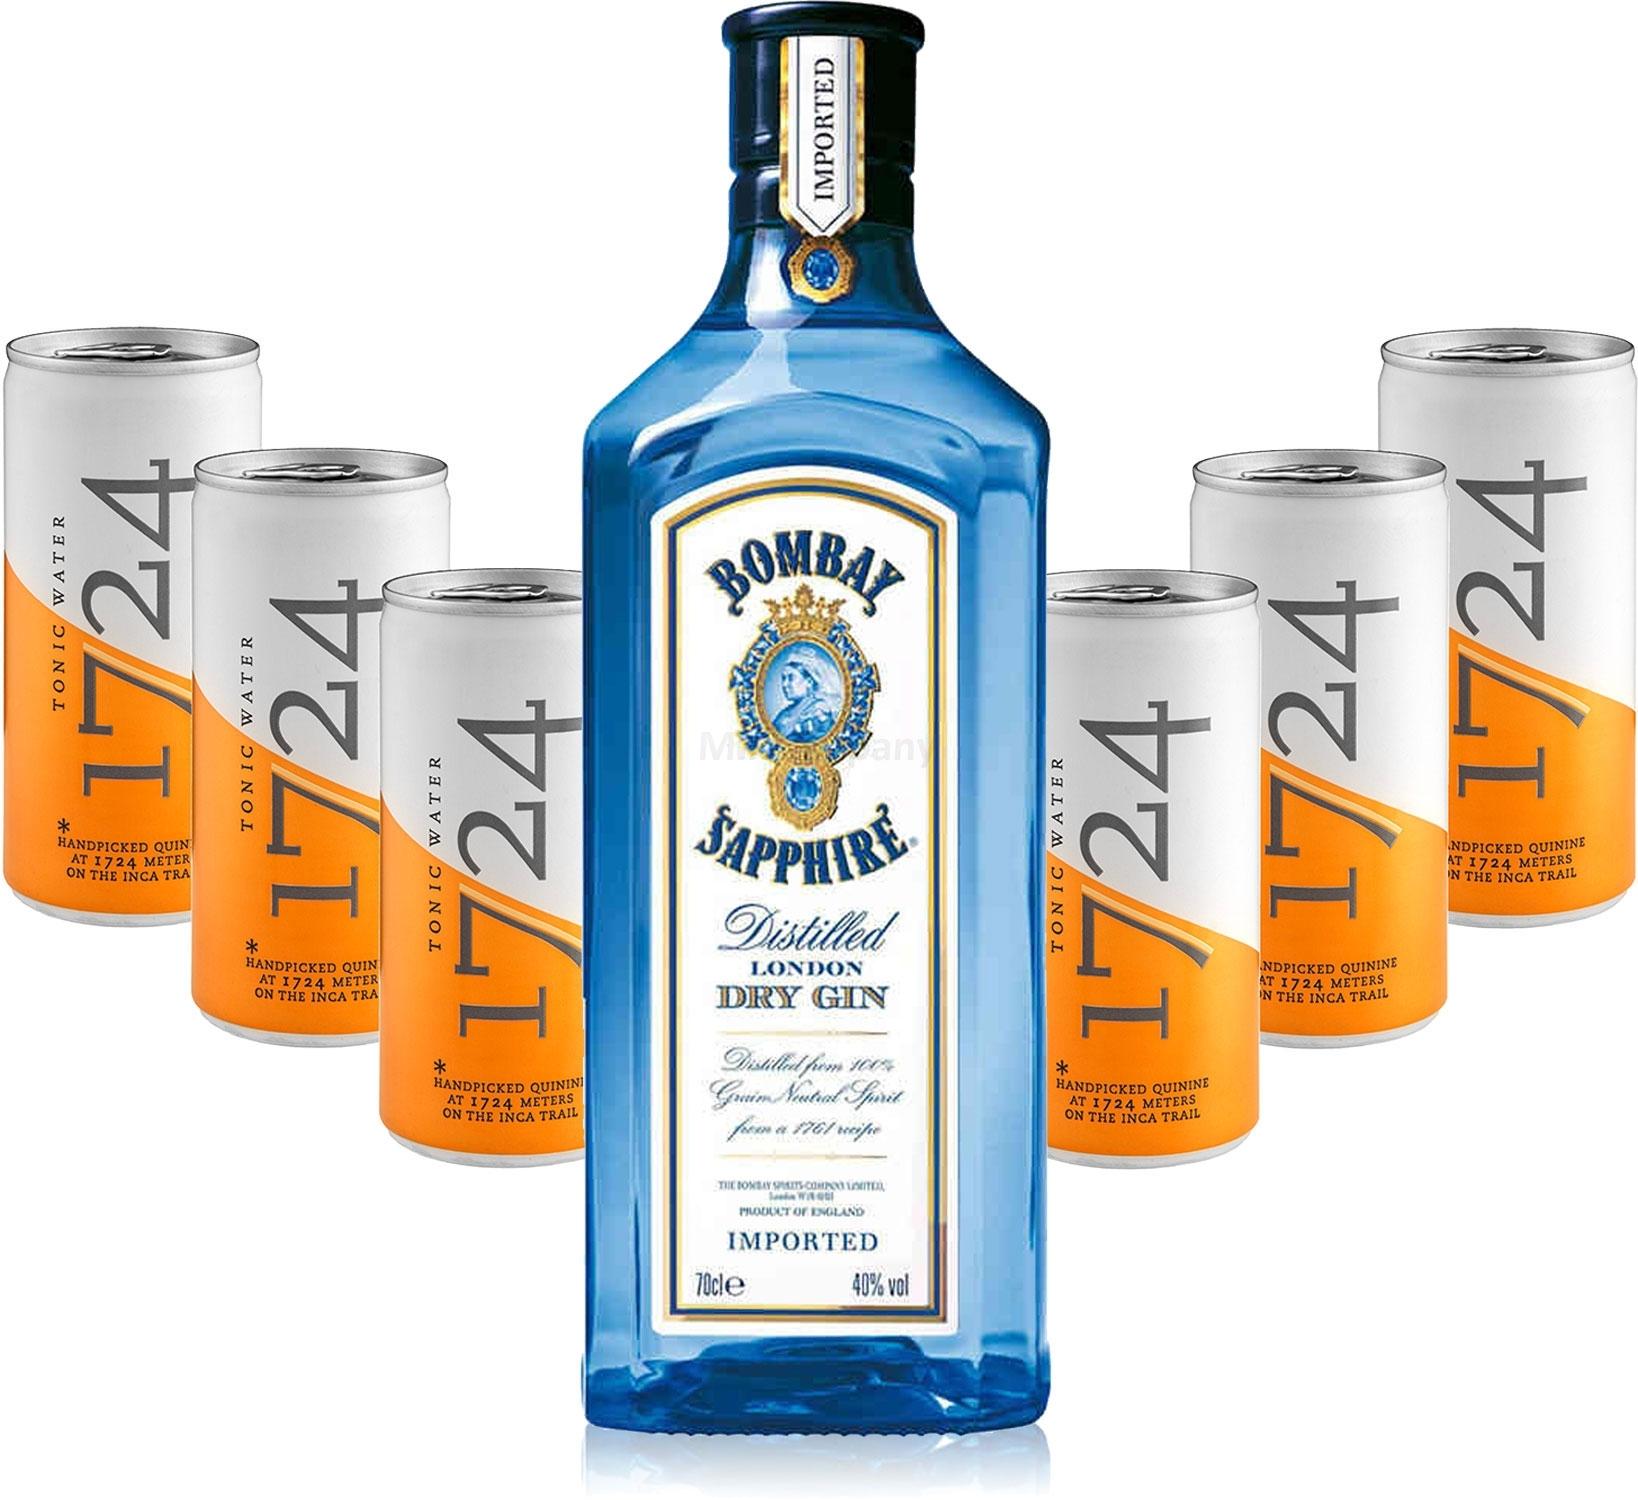 Gin Tonic Set - Bombay Sapphire London Dry Gin 0,7l 700ml (40% Vol) + 6x 1724 Tonic Water 200ml Dosen inkl. Pfand EINWEG -[Enthält Sulfite]